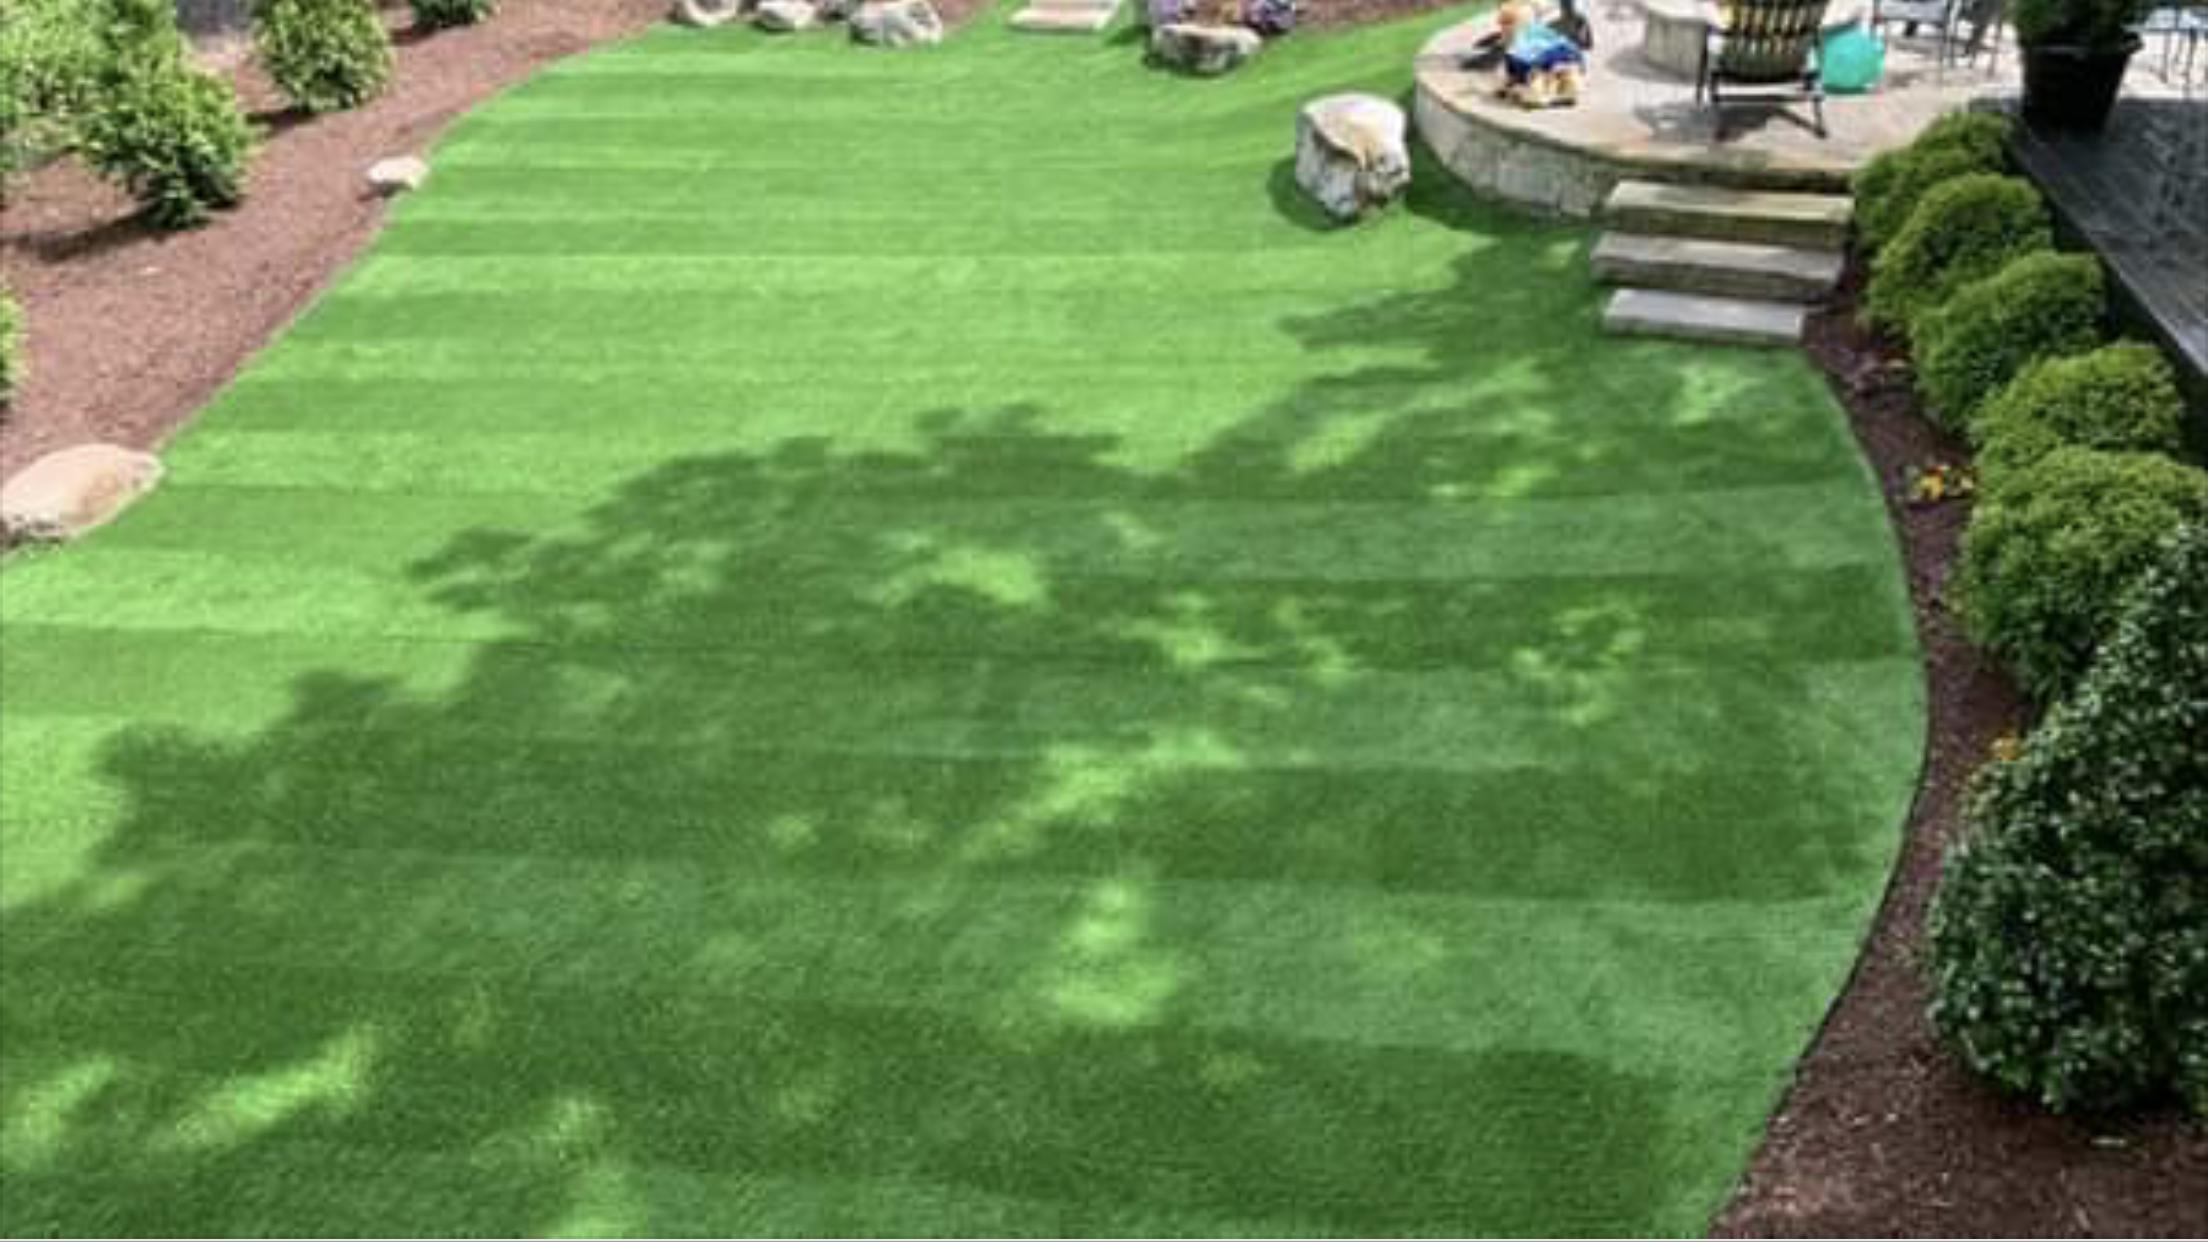 C Blade-92 artificial grass,artificial turf,artificial lawn,artificial grass rug,artificial grass installation,artificial grass,fake grass,synthetic grass,grass carpet,artificial grass rug,fake grass for yard,backyard turf,turf backyard,turf yard,fake grass for backyard